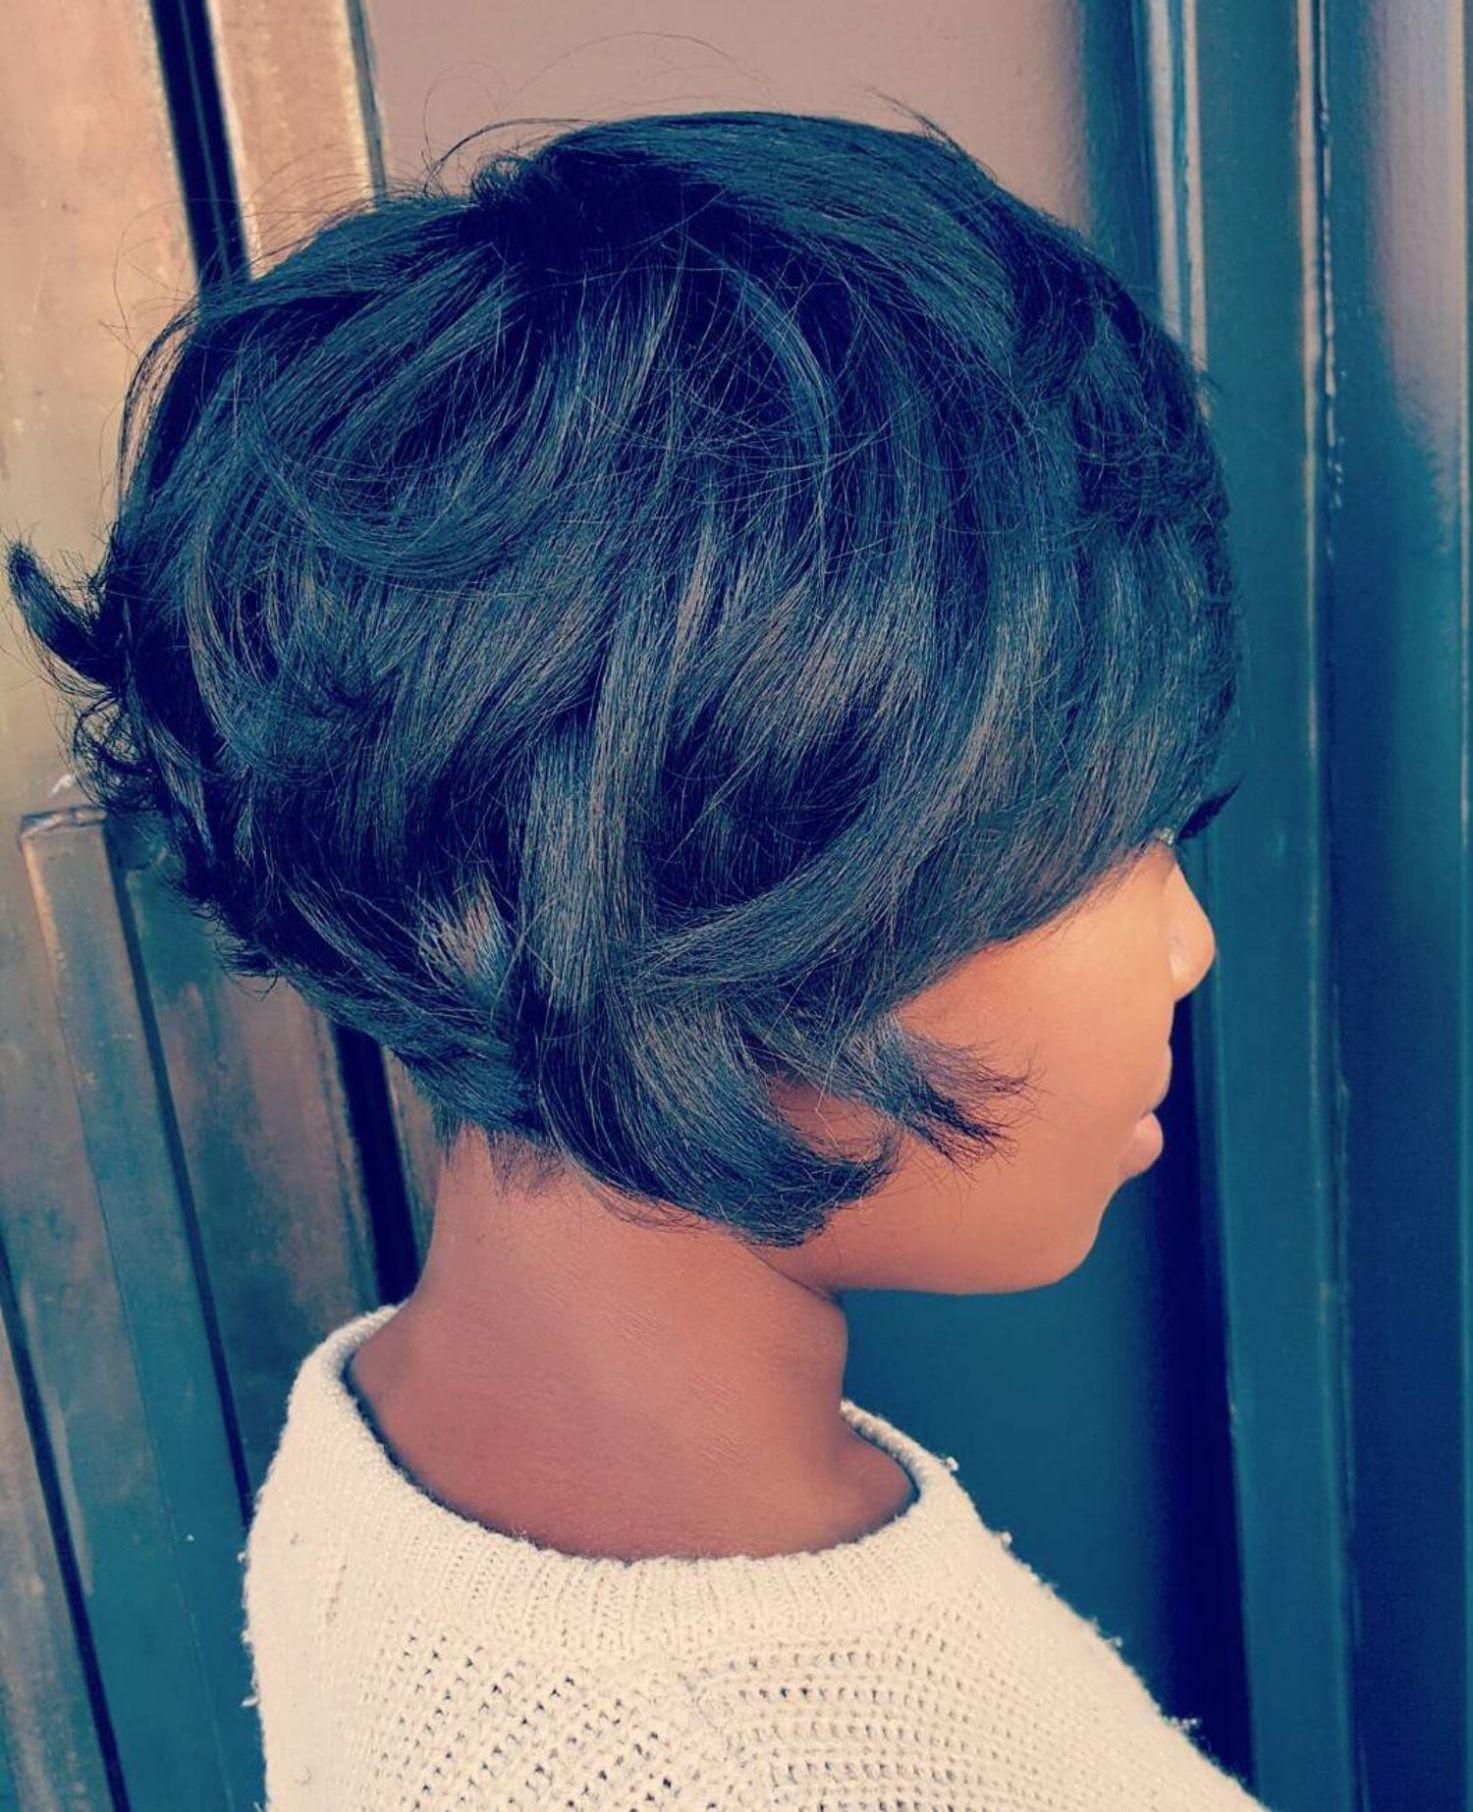 60 Great Short Hairstyles For Black Women Choppy Bob Hairstyles Short Hair Styles Short Bob Hairstyles